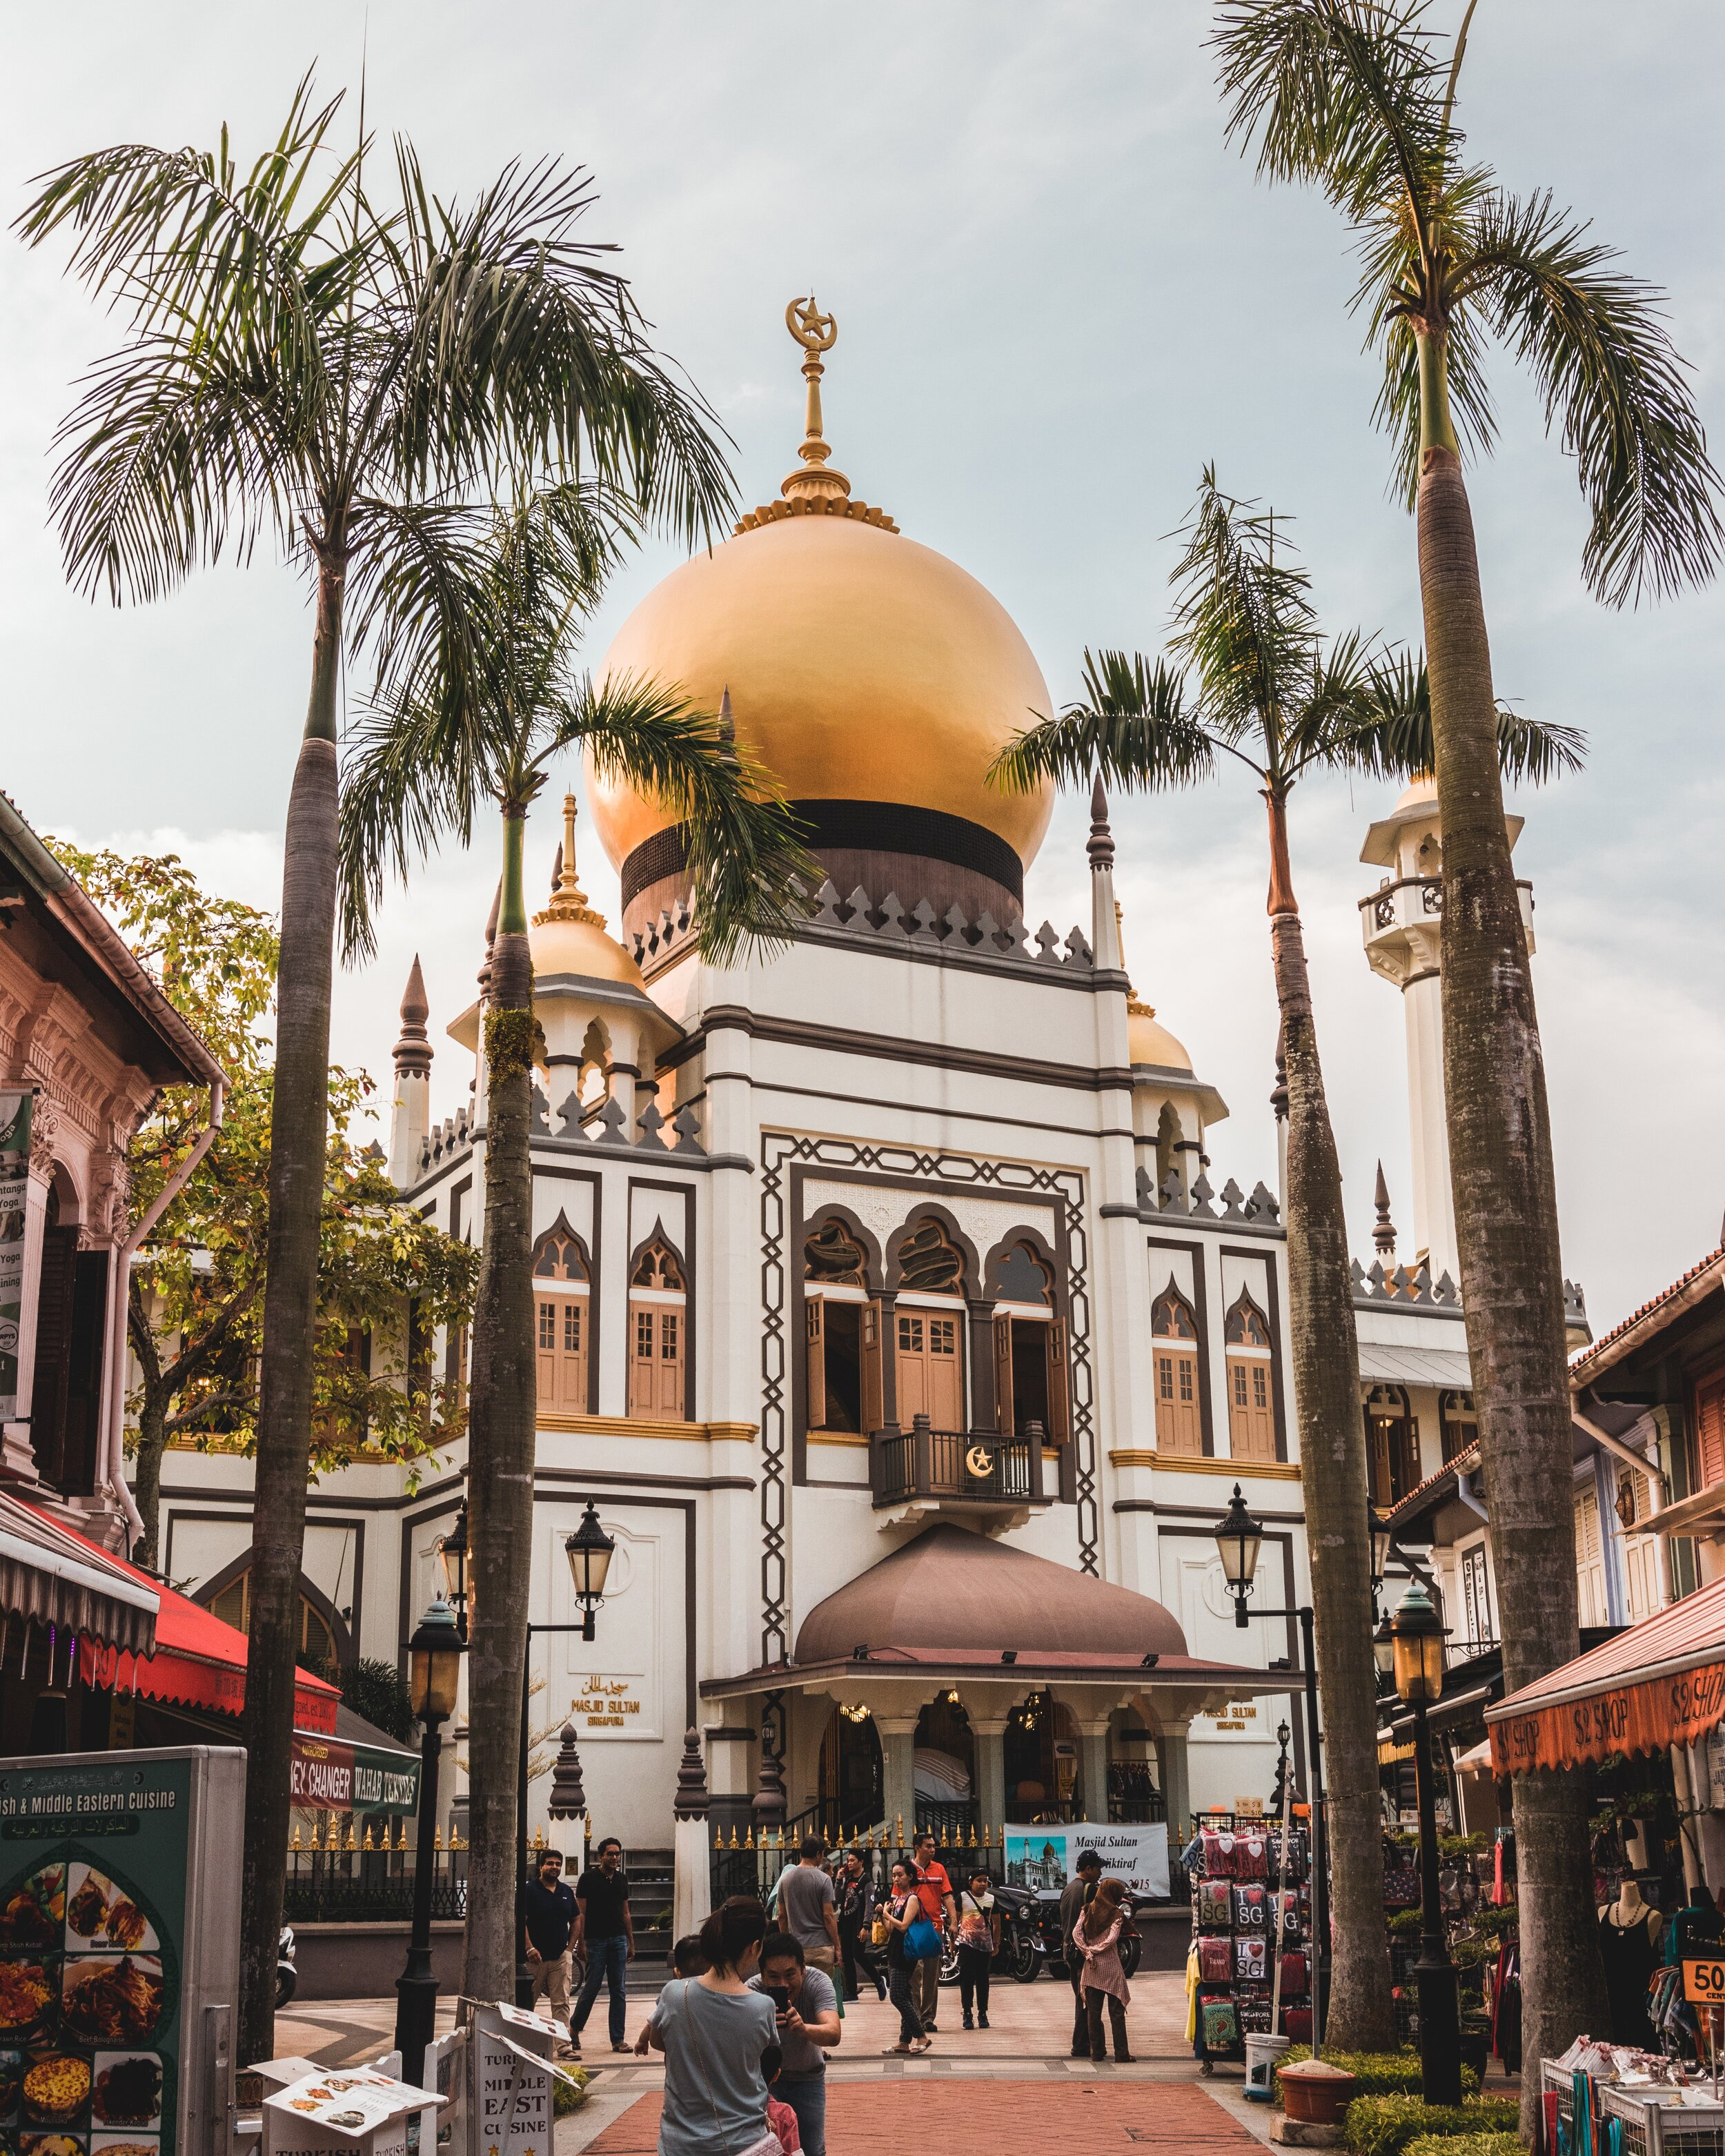 Kampong Glam neighborhood in Singapore